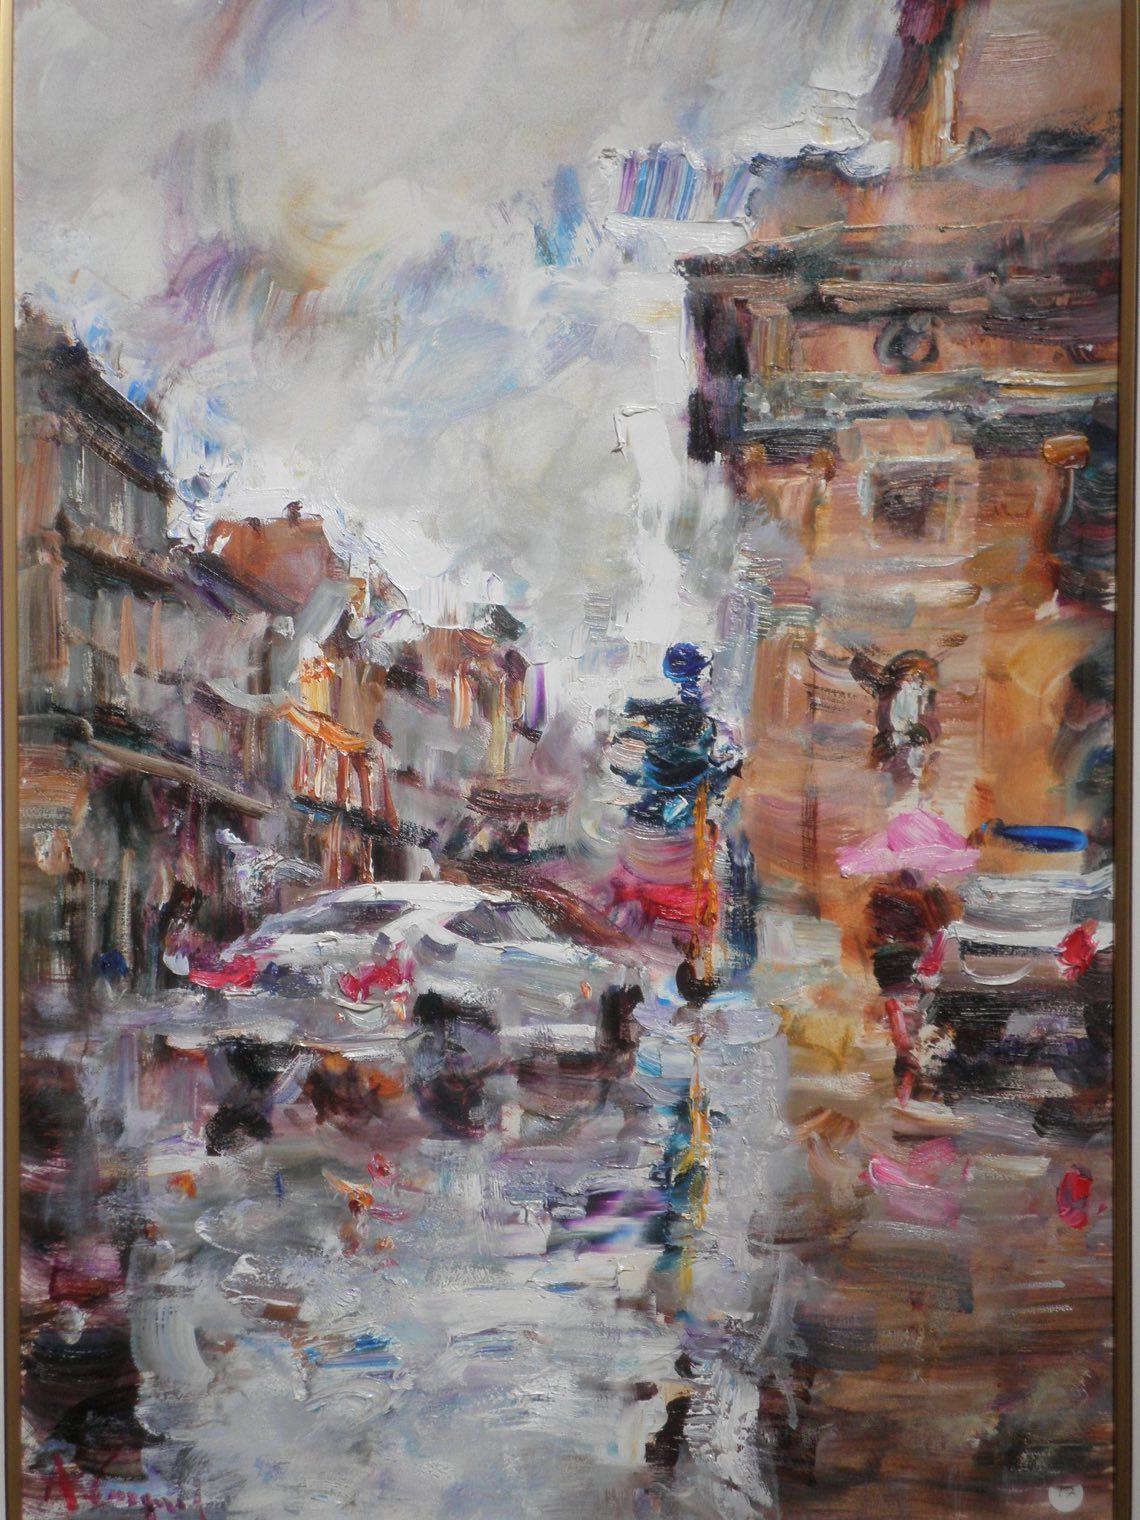 A.Cargnel - Impressione di pioggia a Porta Venezia- cm.50 x 70 -olio su tela - OLYMPUS DIGITAL CAMERA